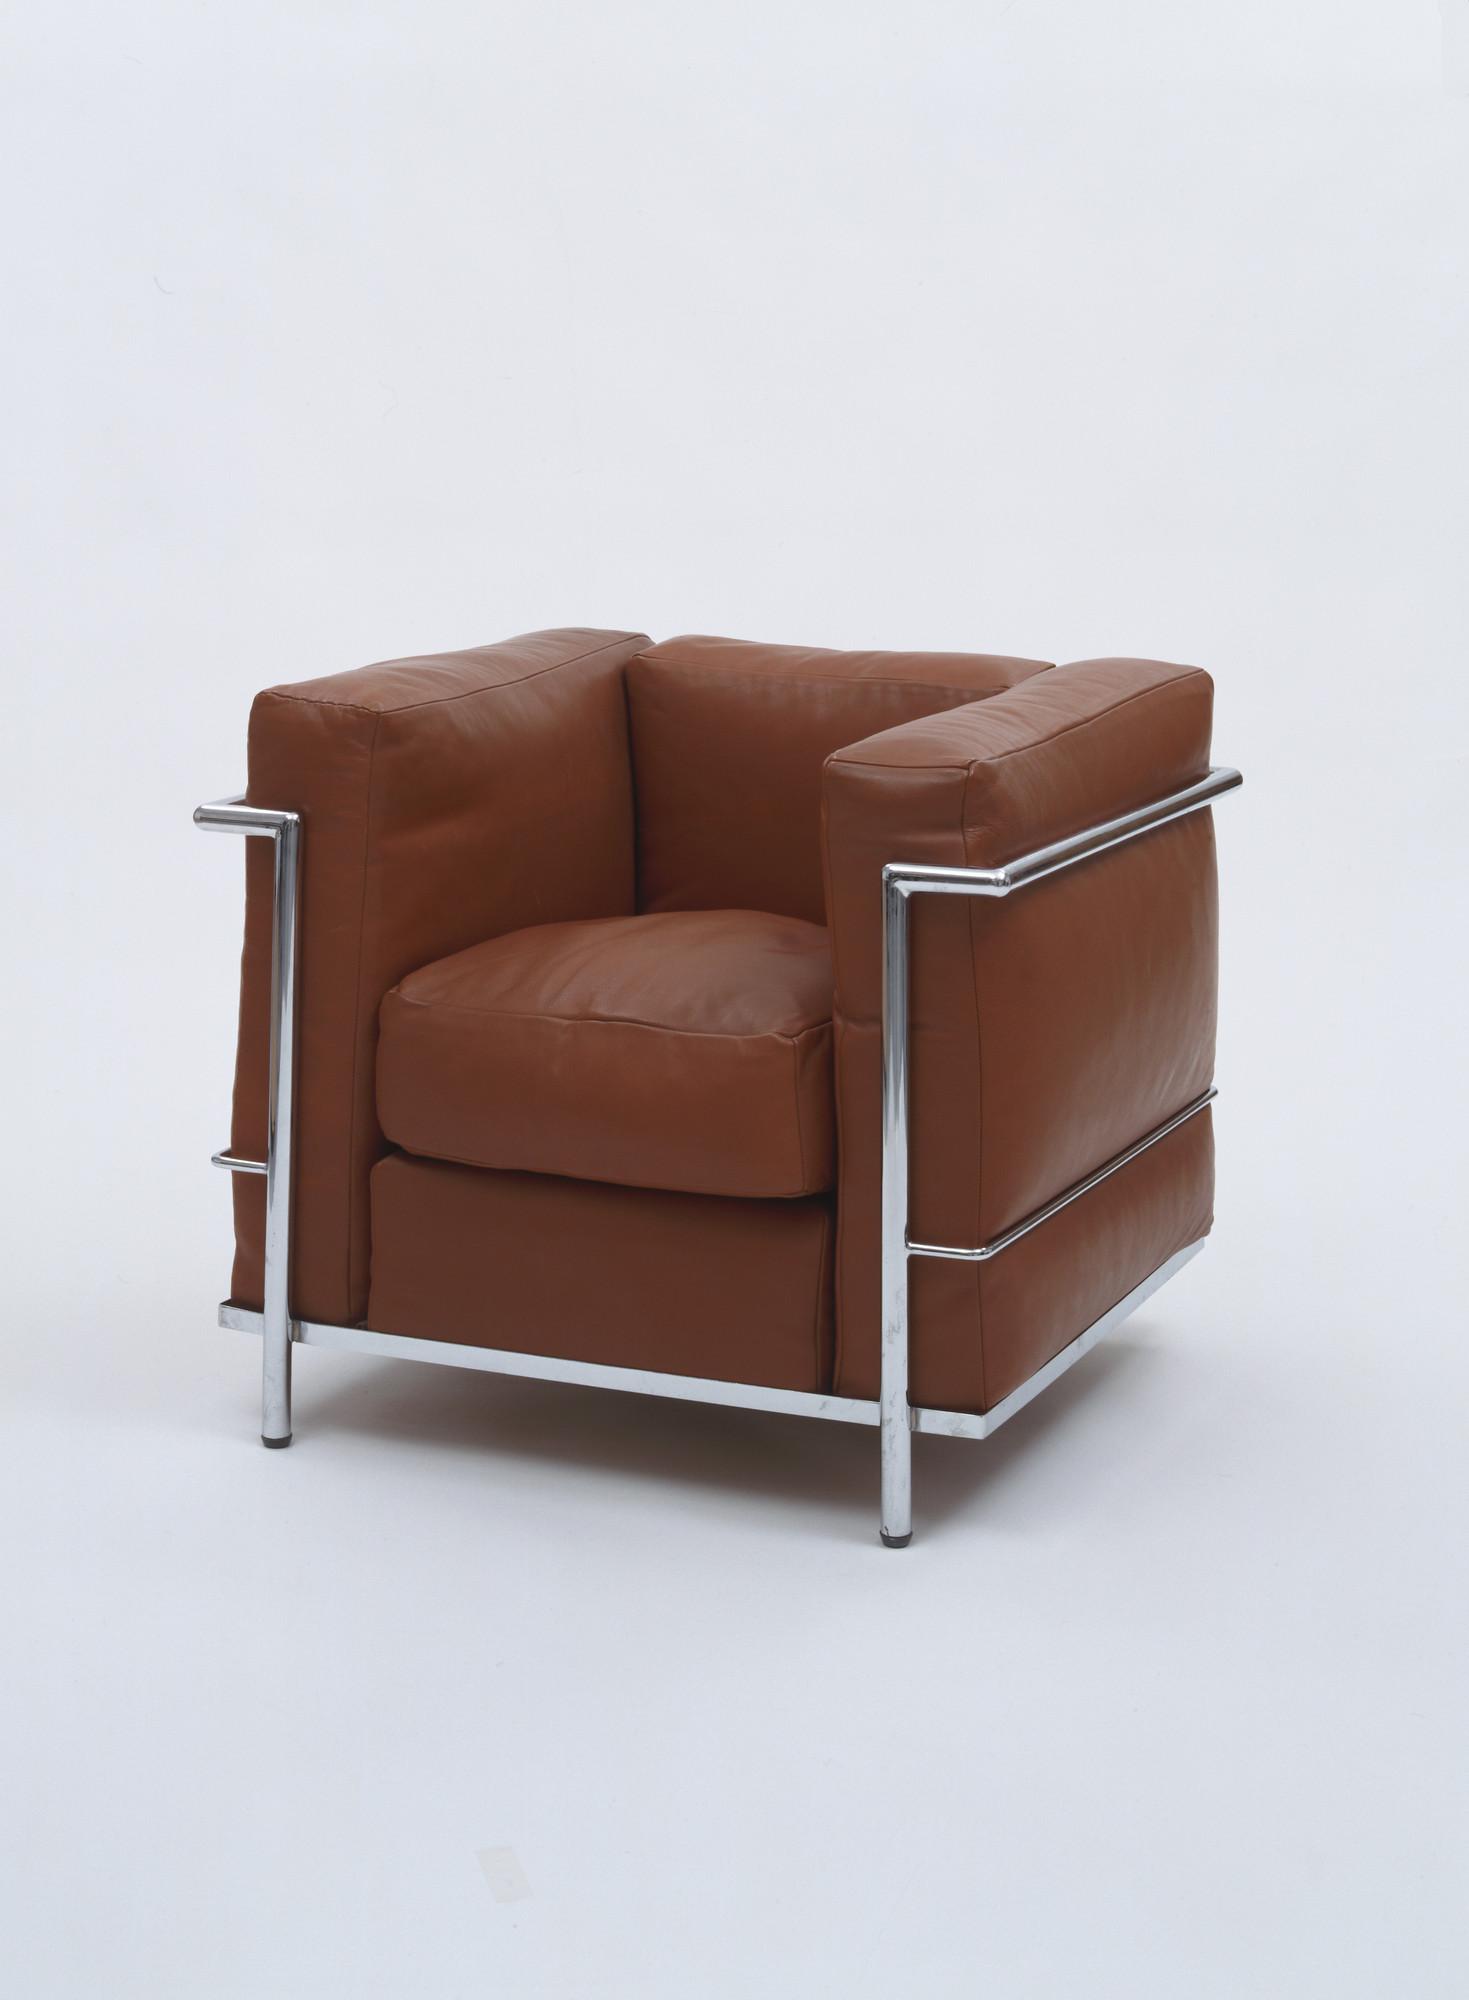 Peachy Le Corbusier Charles Edouard Jeanneret Pierre Jeanneret Inzonedesignstudio Interior Chair Design Inzonedesignstudiocom